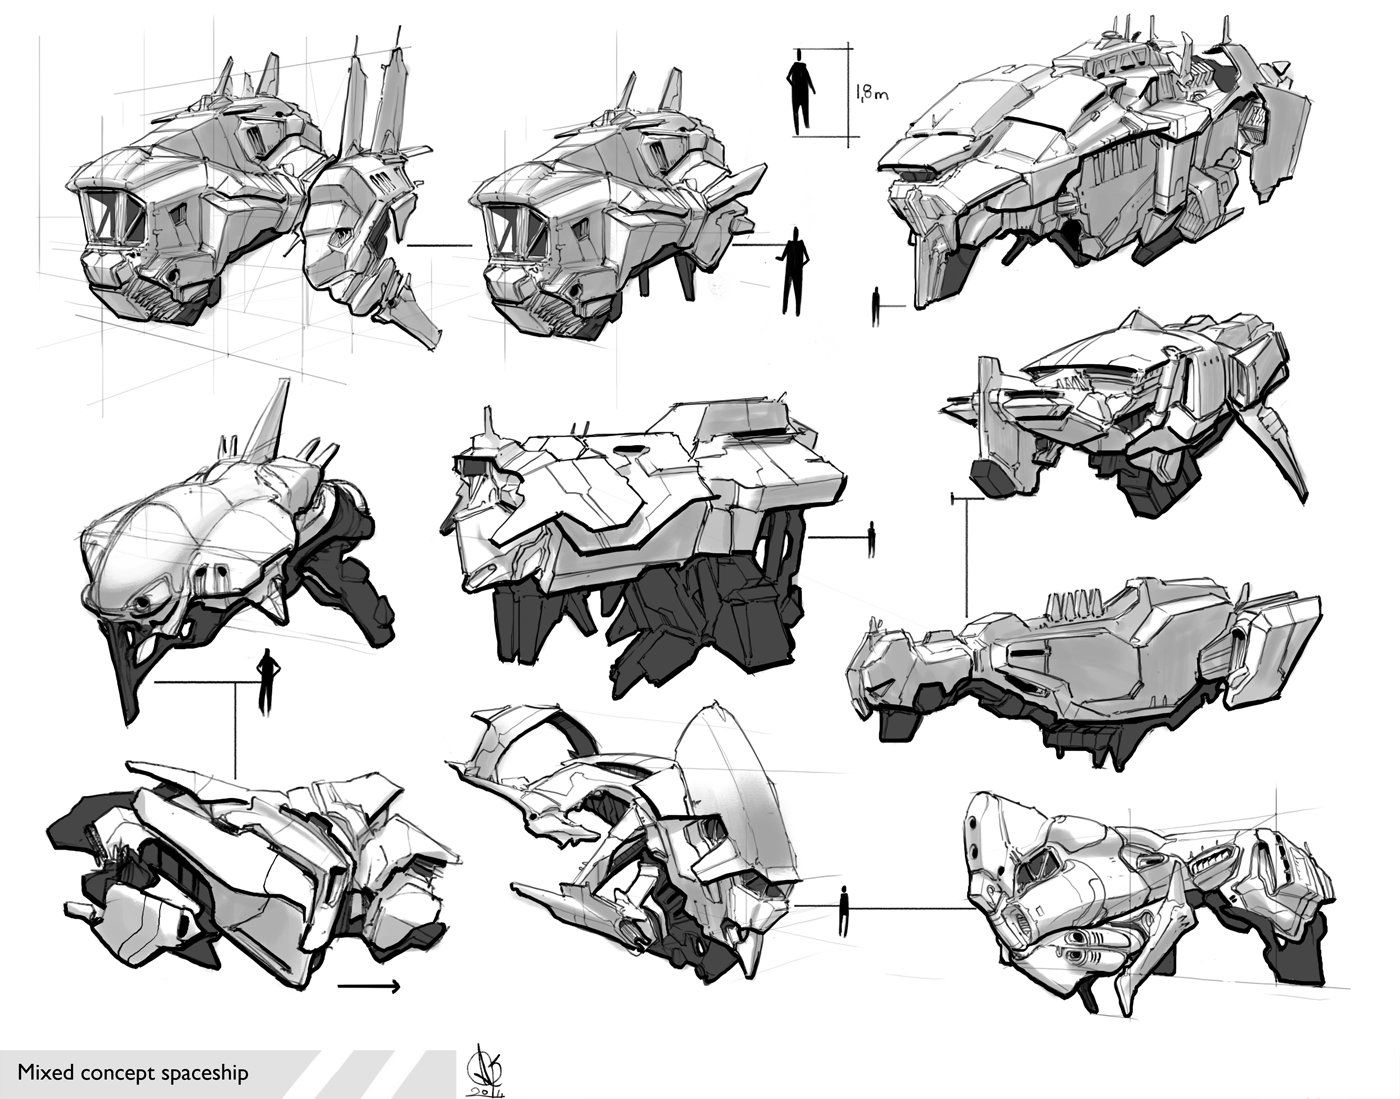 ArtStation - Space ship, David Sequeira